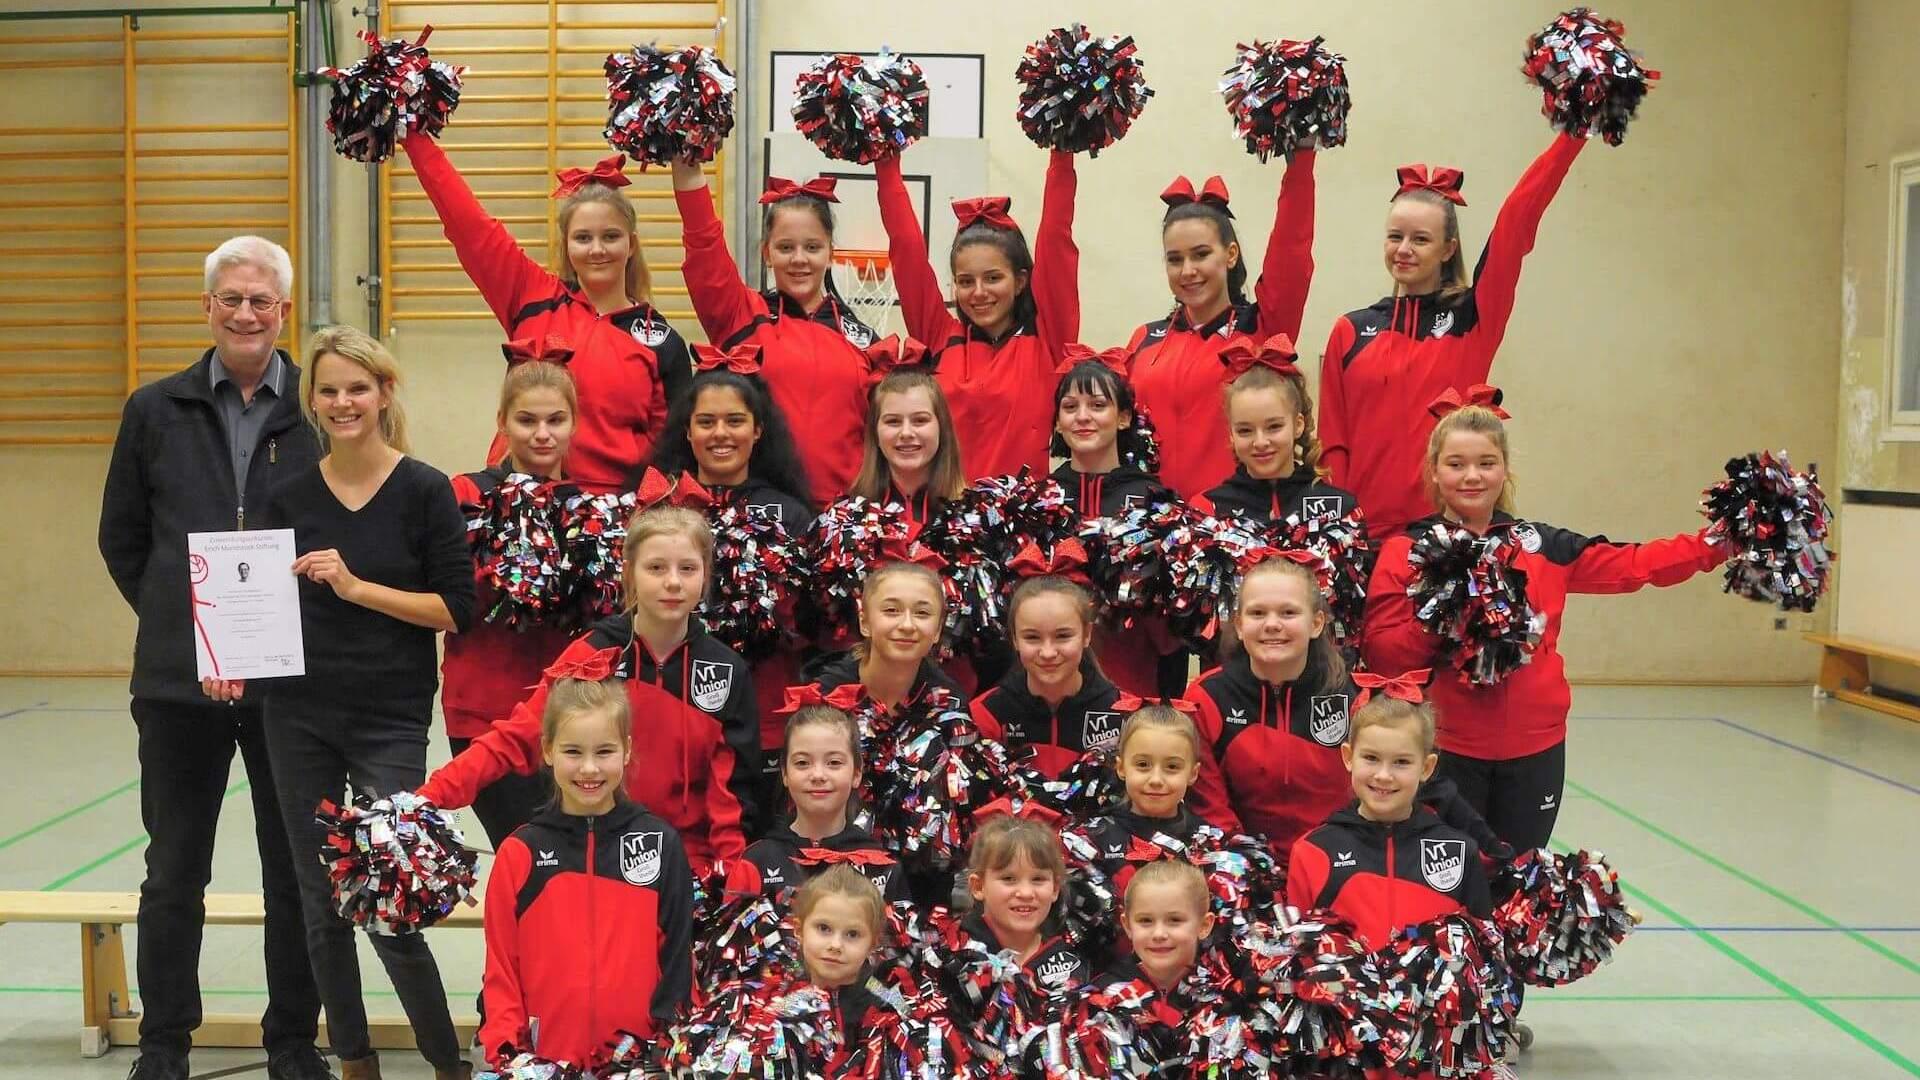 Cheerleader VT Union Groß Ilsede